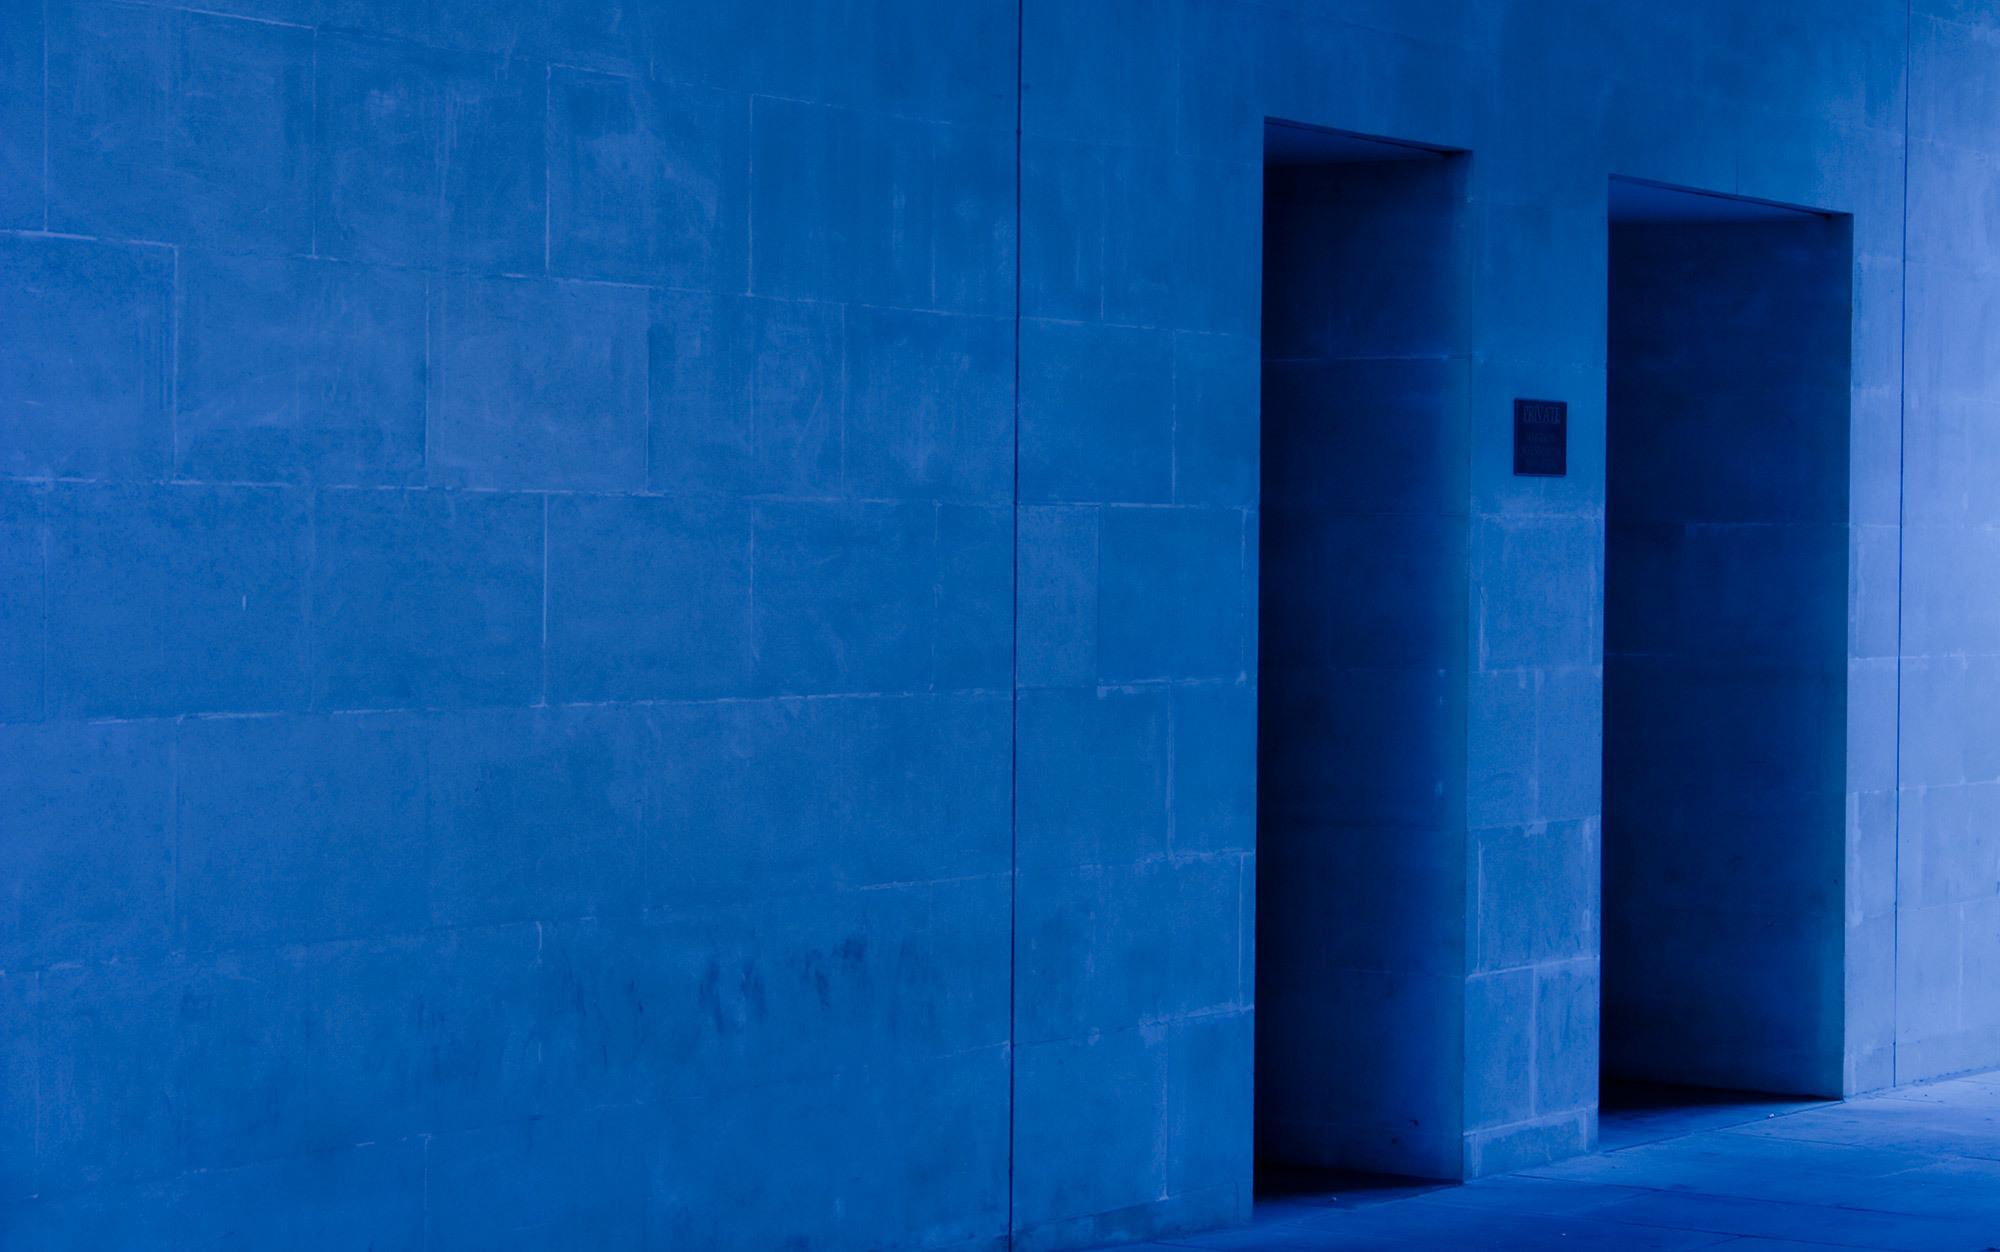 Through two doors | Aeon